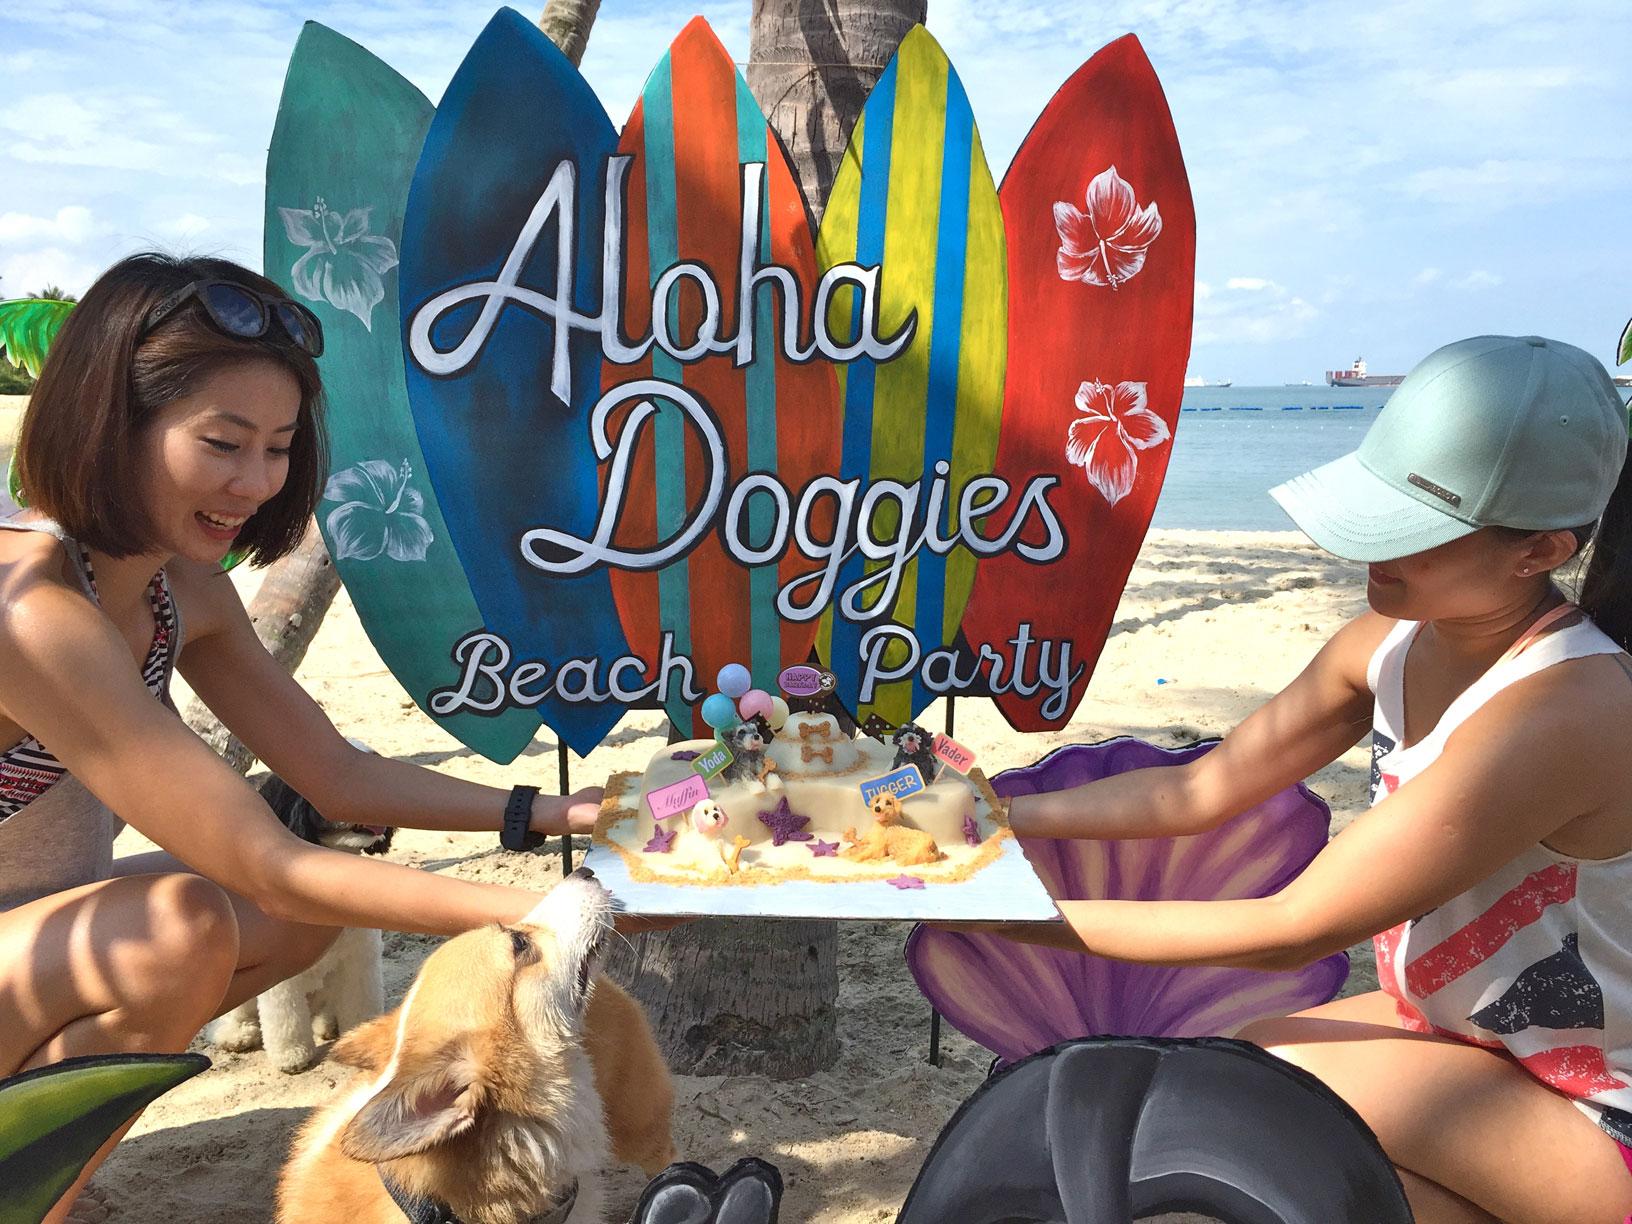 Aloha-Doggies-Beach-Party-cake